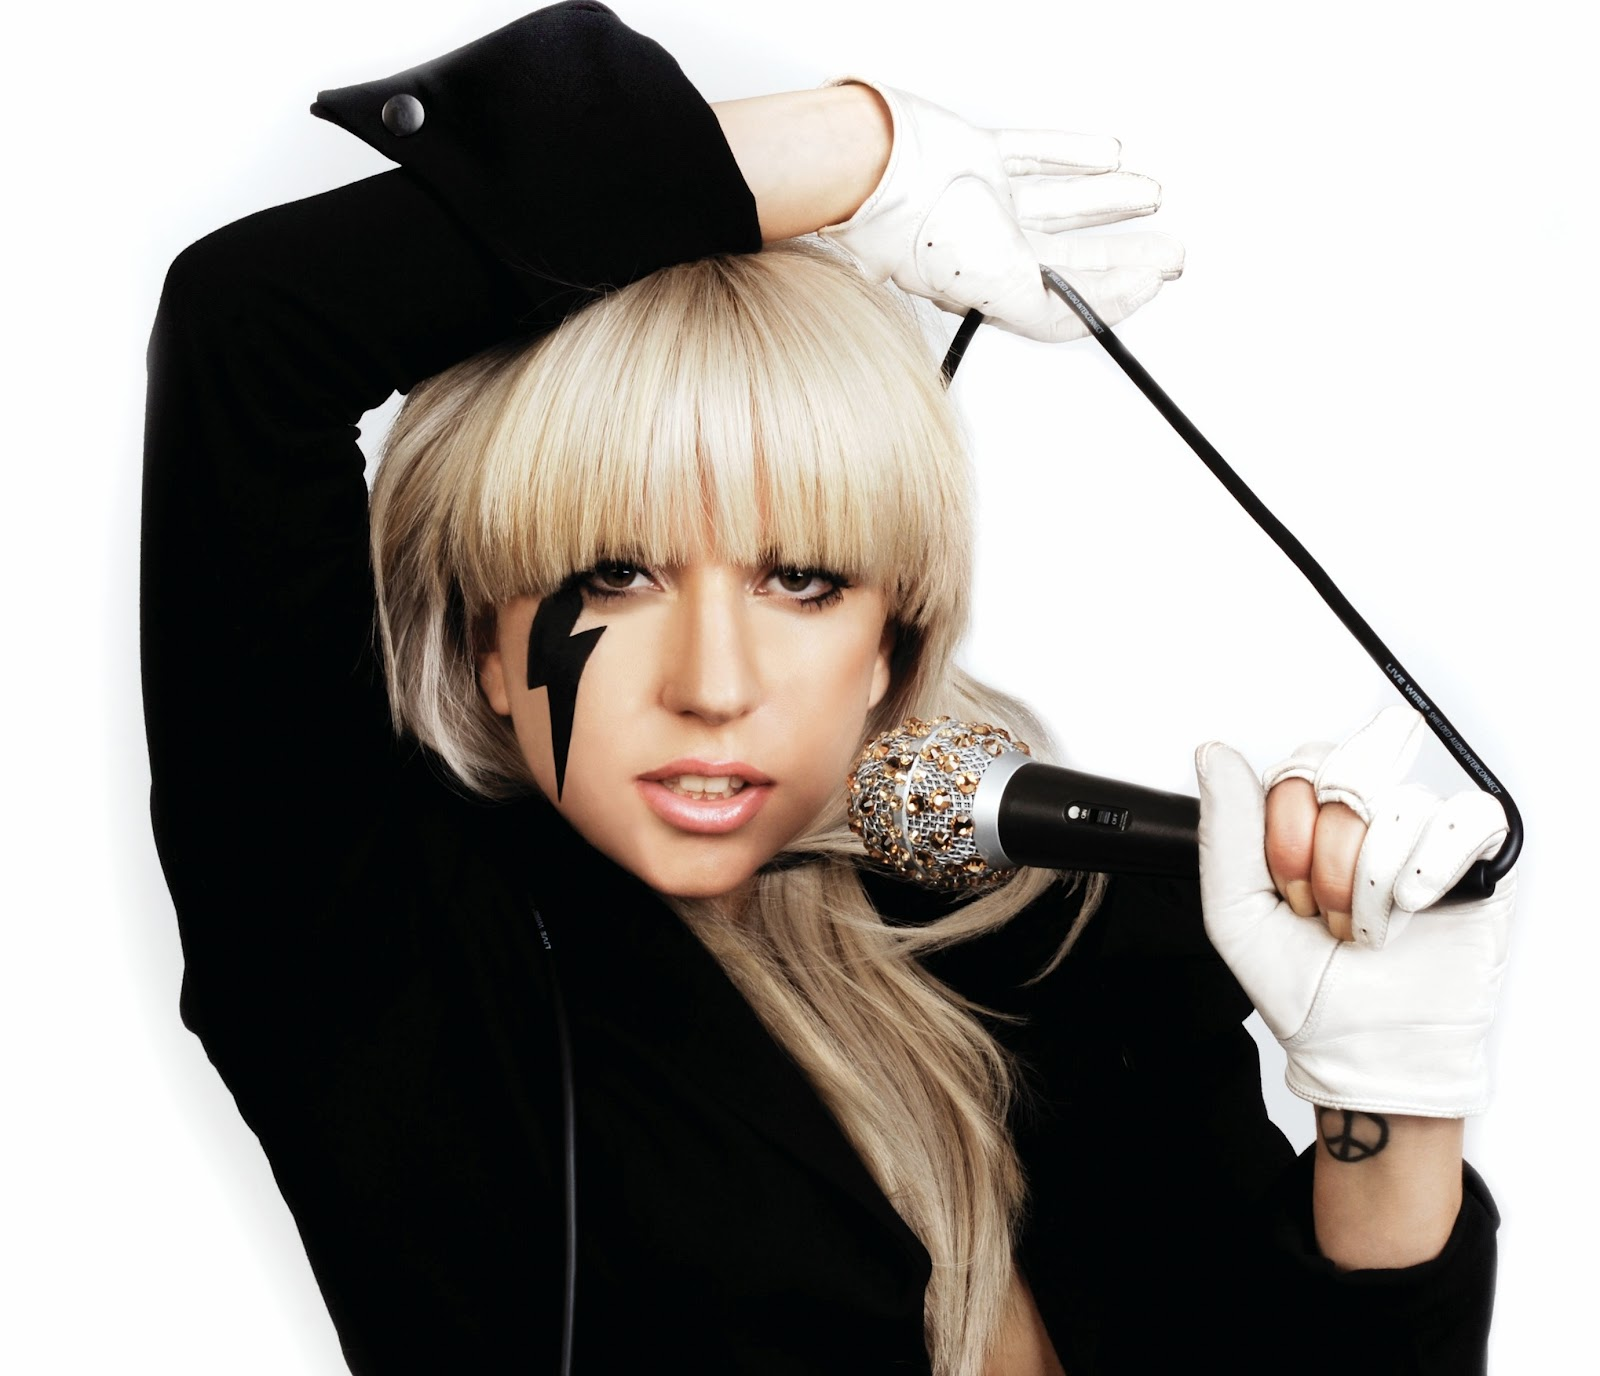 http://4.bp.blogspot.com/-h1voiGtpYBs/T9alzPwlAsI/AAAAAAAADow/8Mux1rNfkRI/s1600/Lady-Gaga-Piccol+(3).jpg